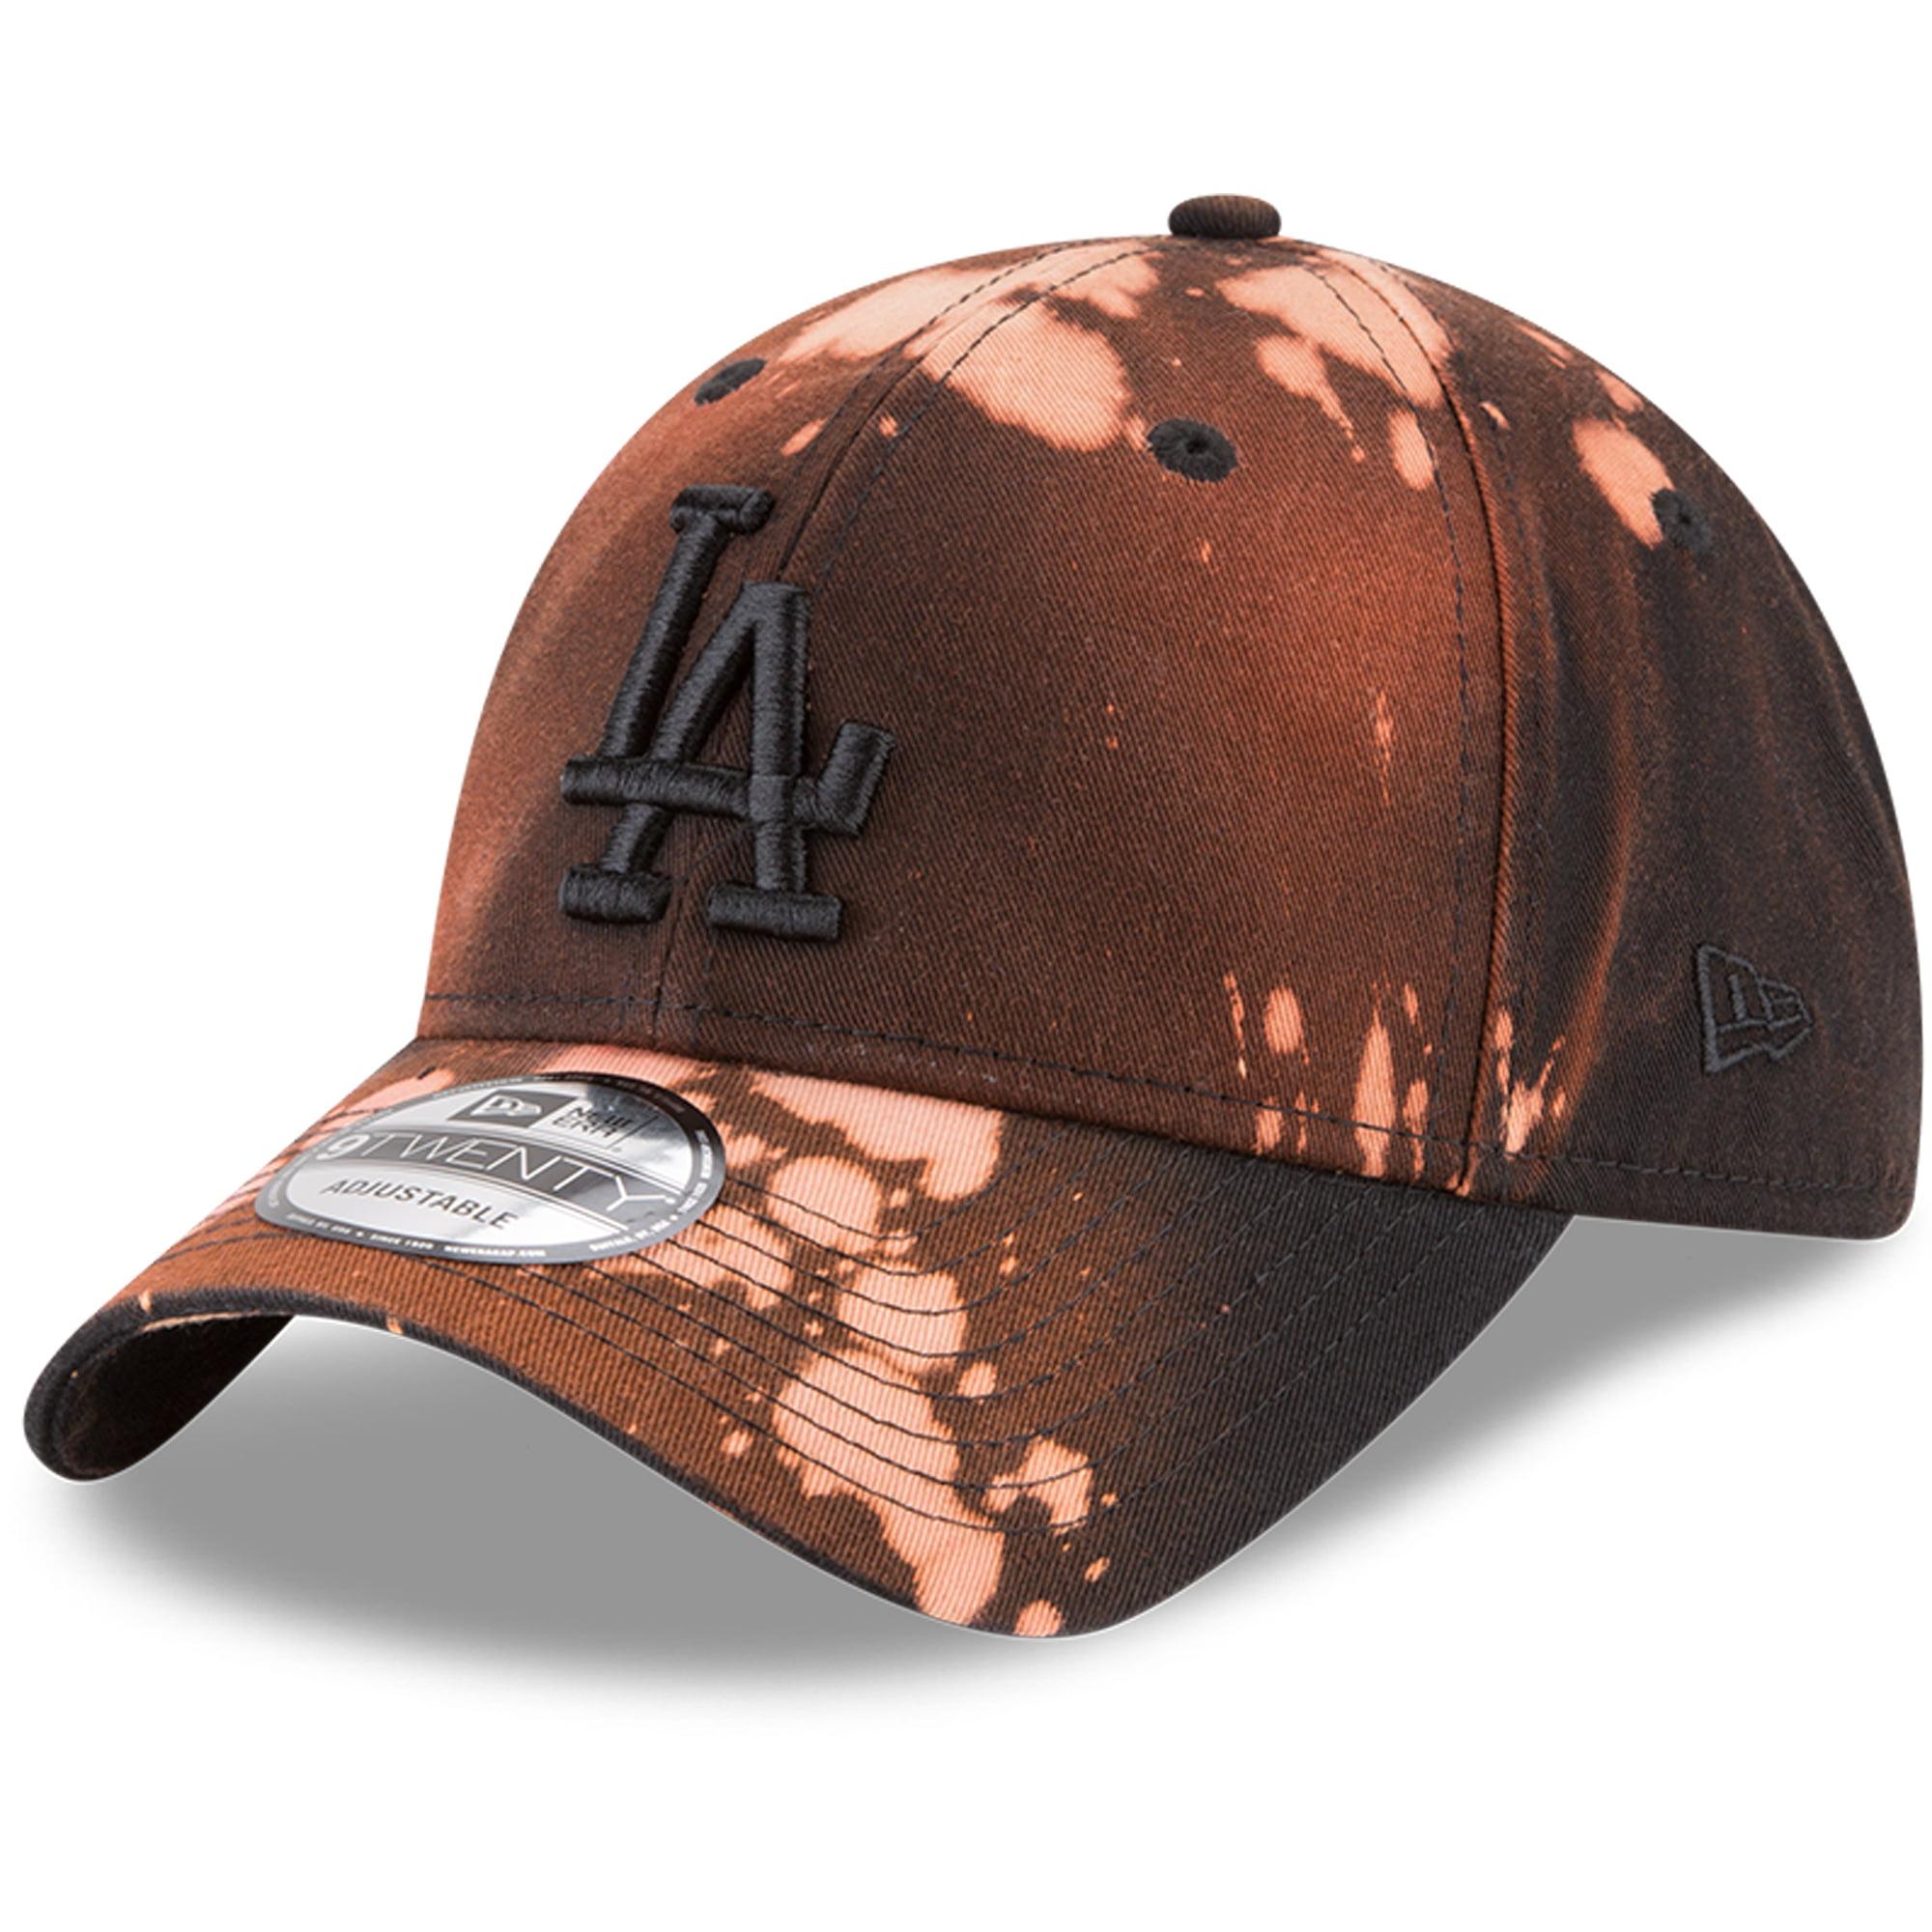 Los Angeles Dodgers New Era Bleached Out 9TWENTY Adjustable Hat - Black - OSFA